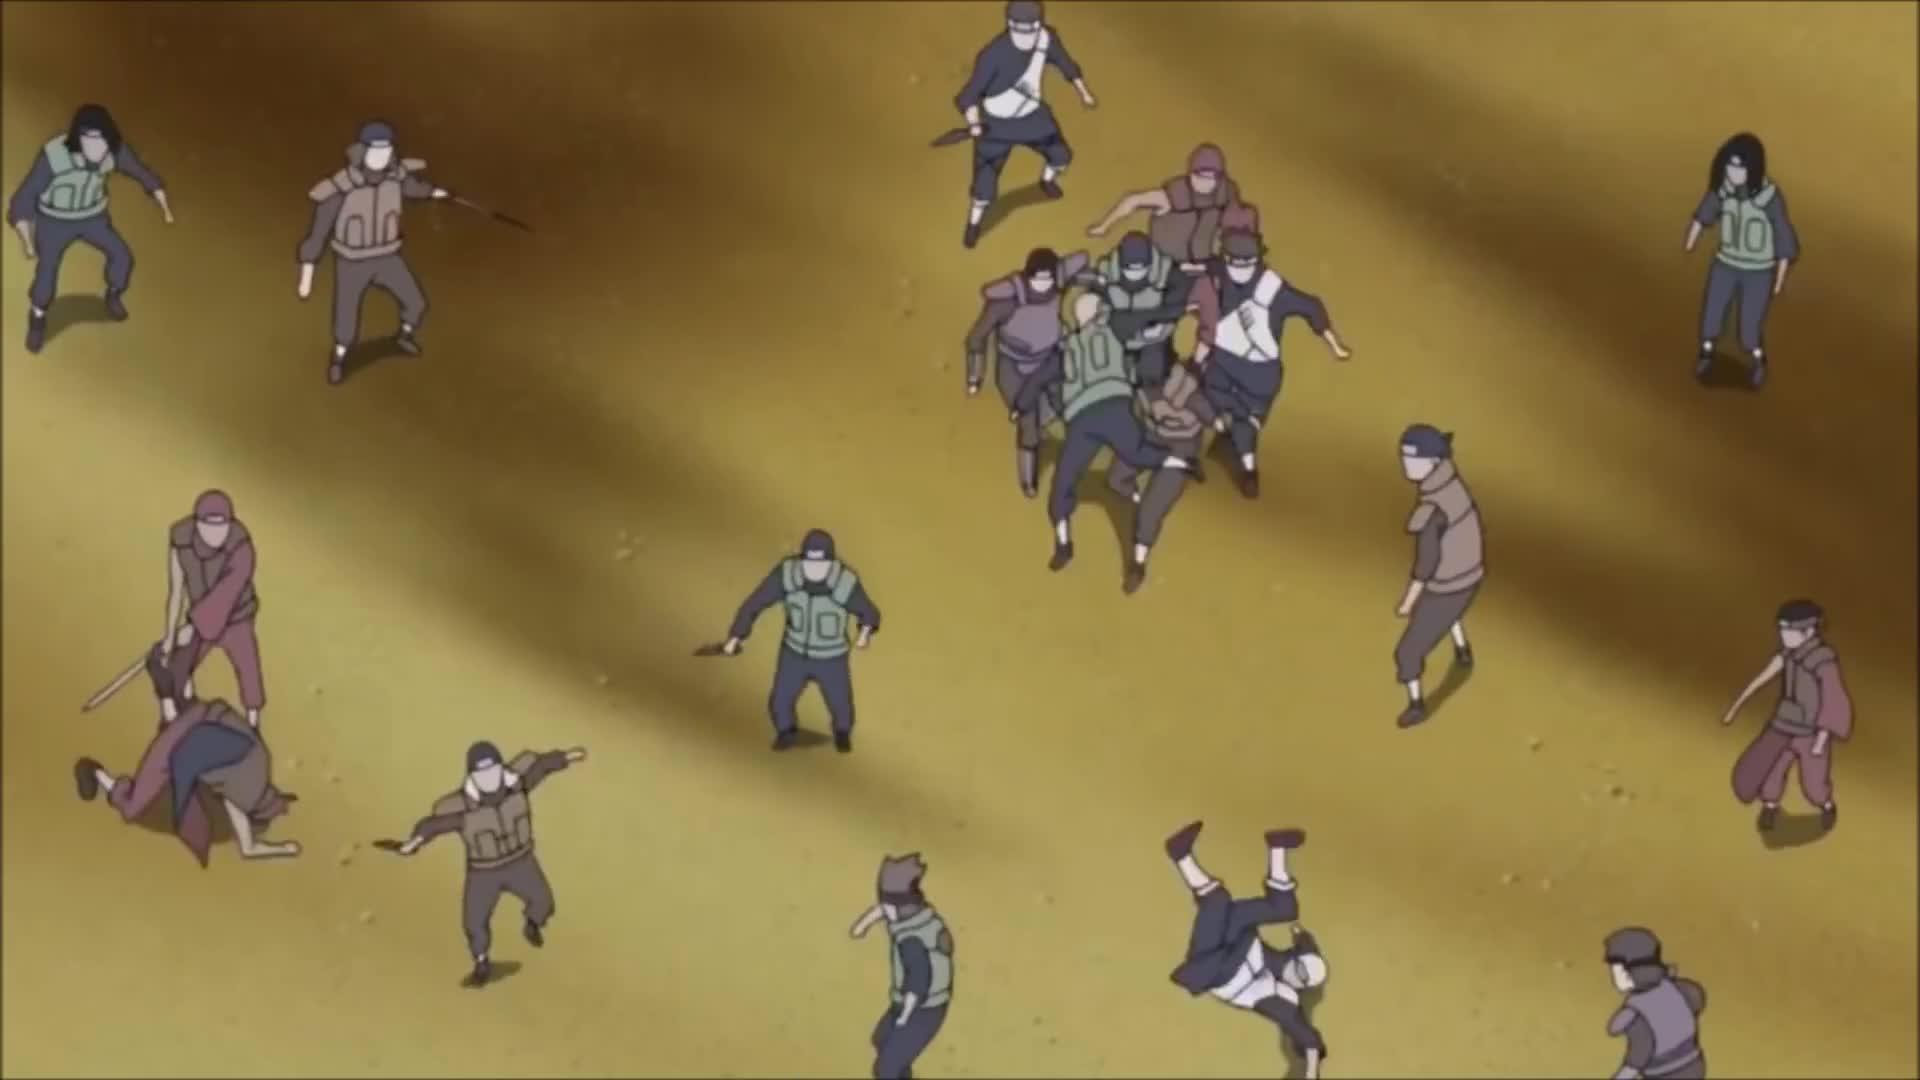 Naruto Shinobi Alliance Vs Uchiha Madara Gif By Sanzensekai92 Gfycat